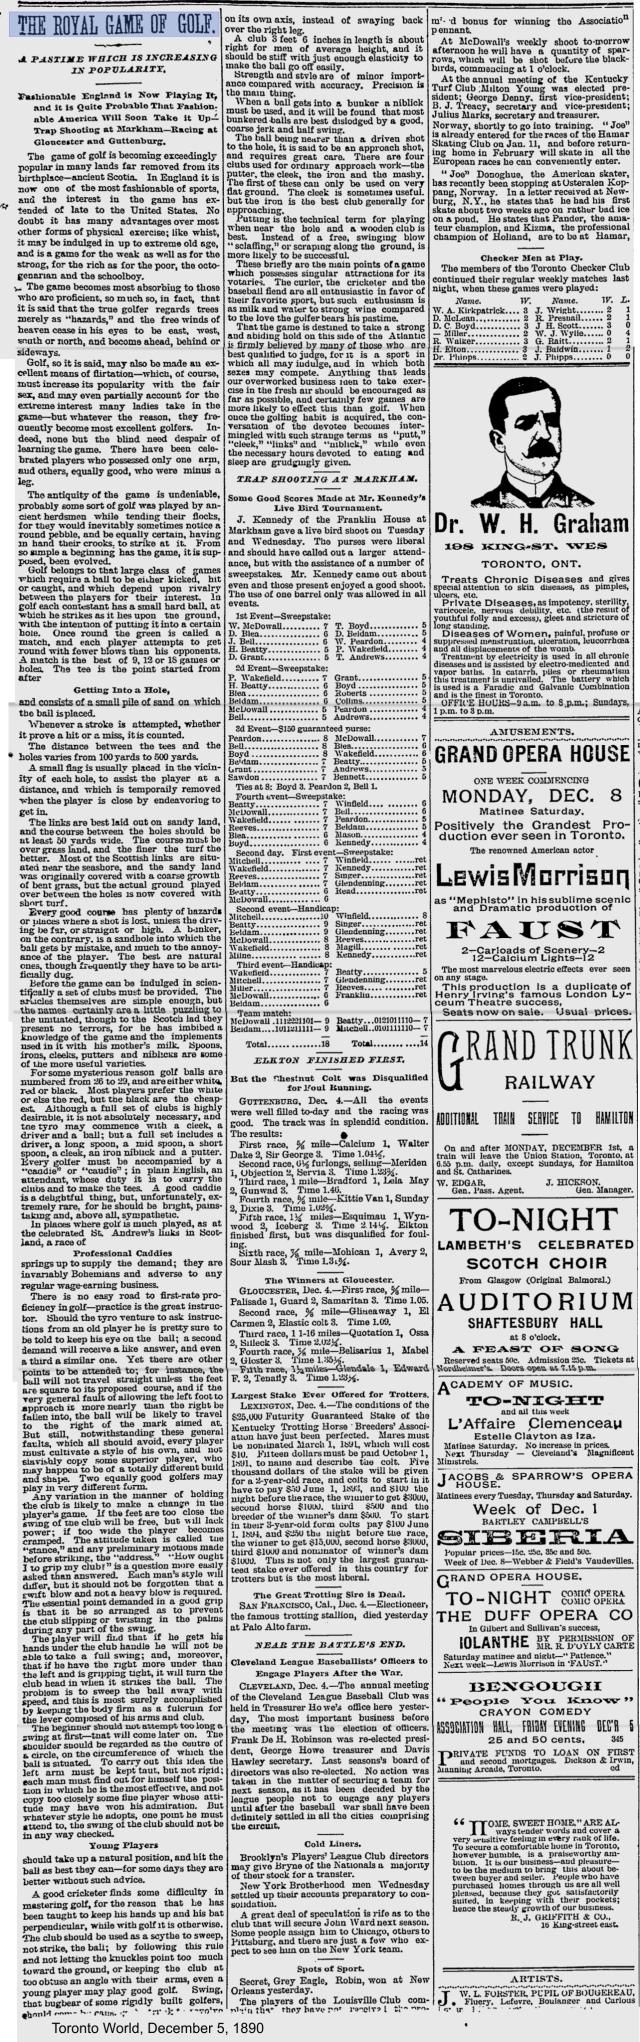 Toronto World, December 5, 1890